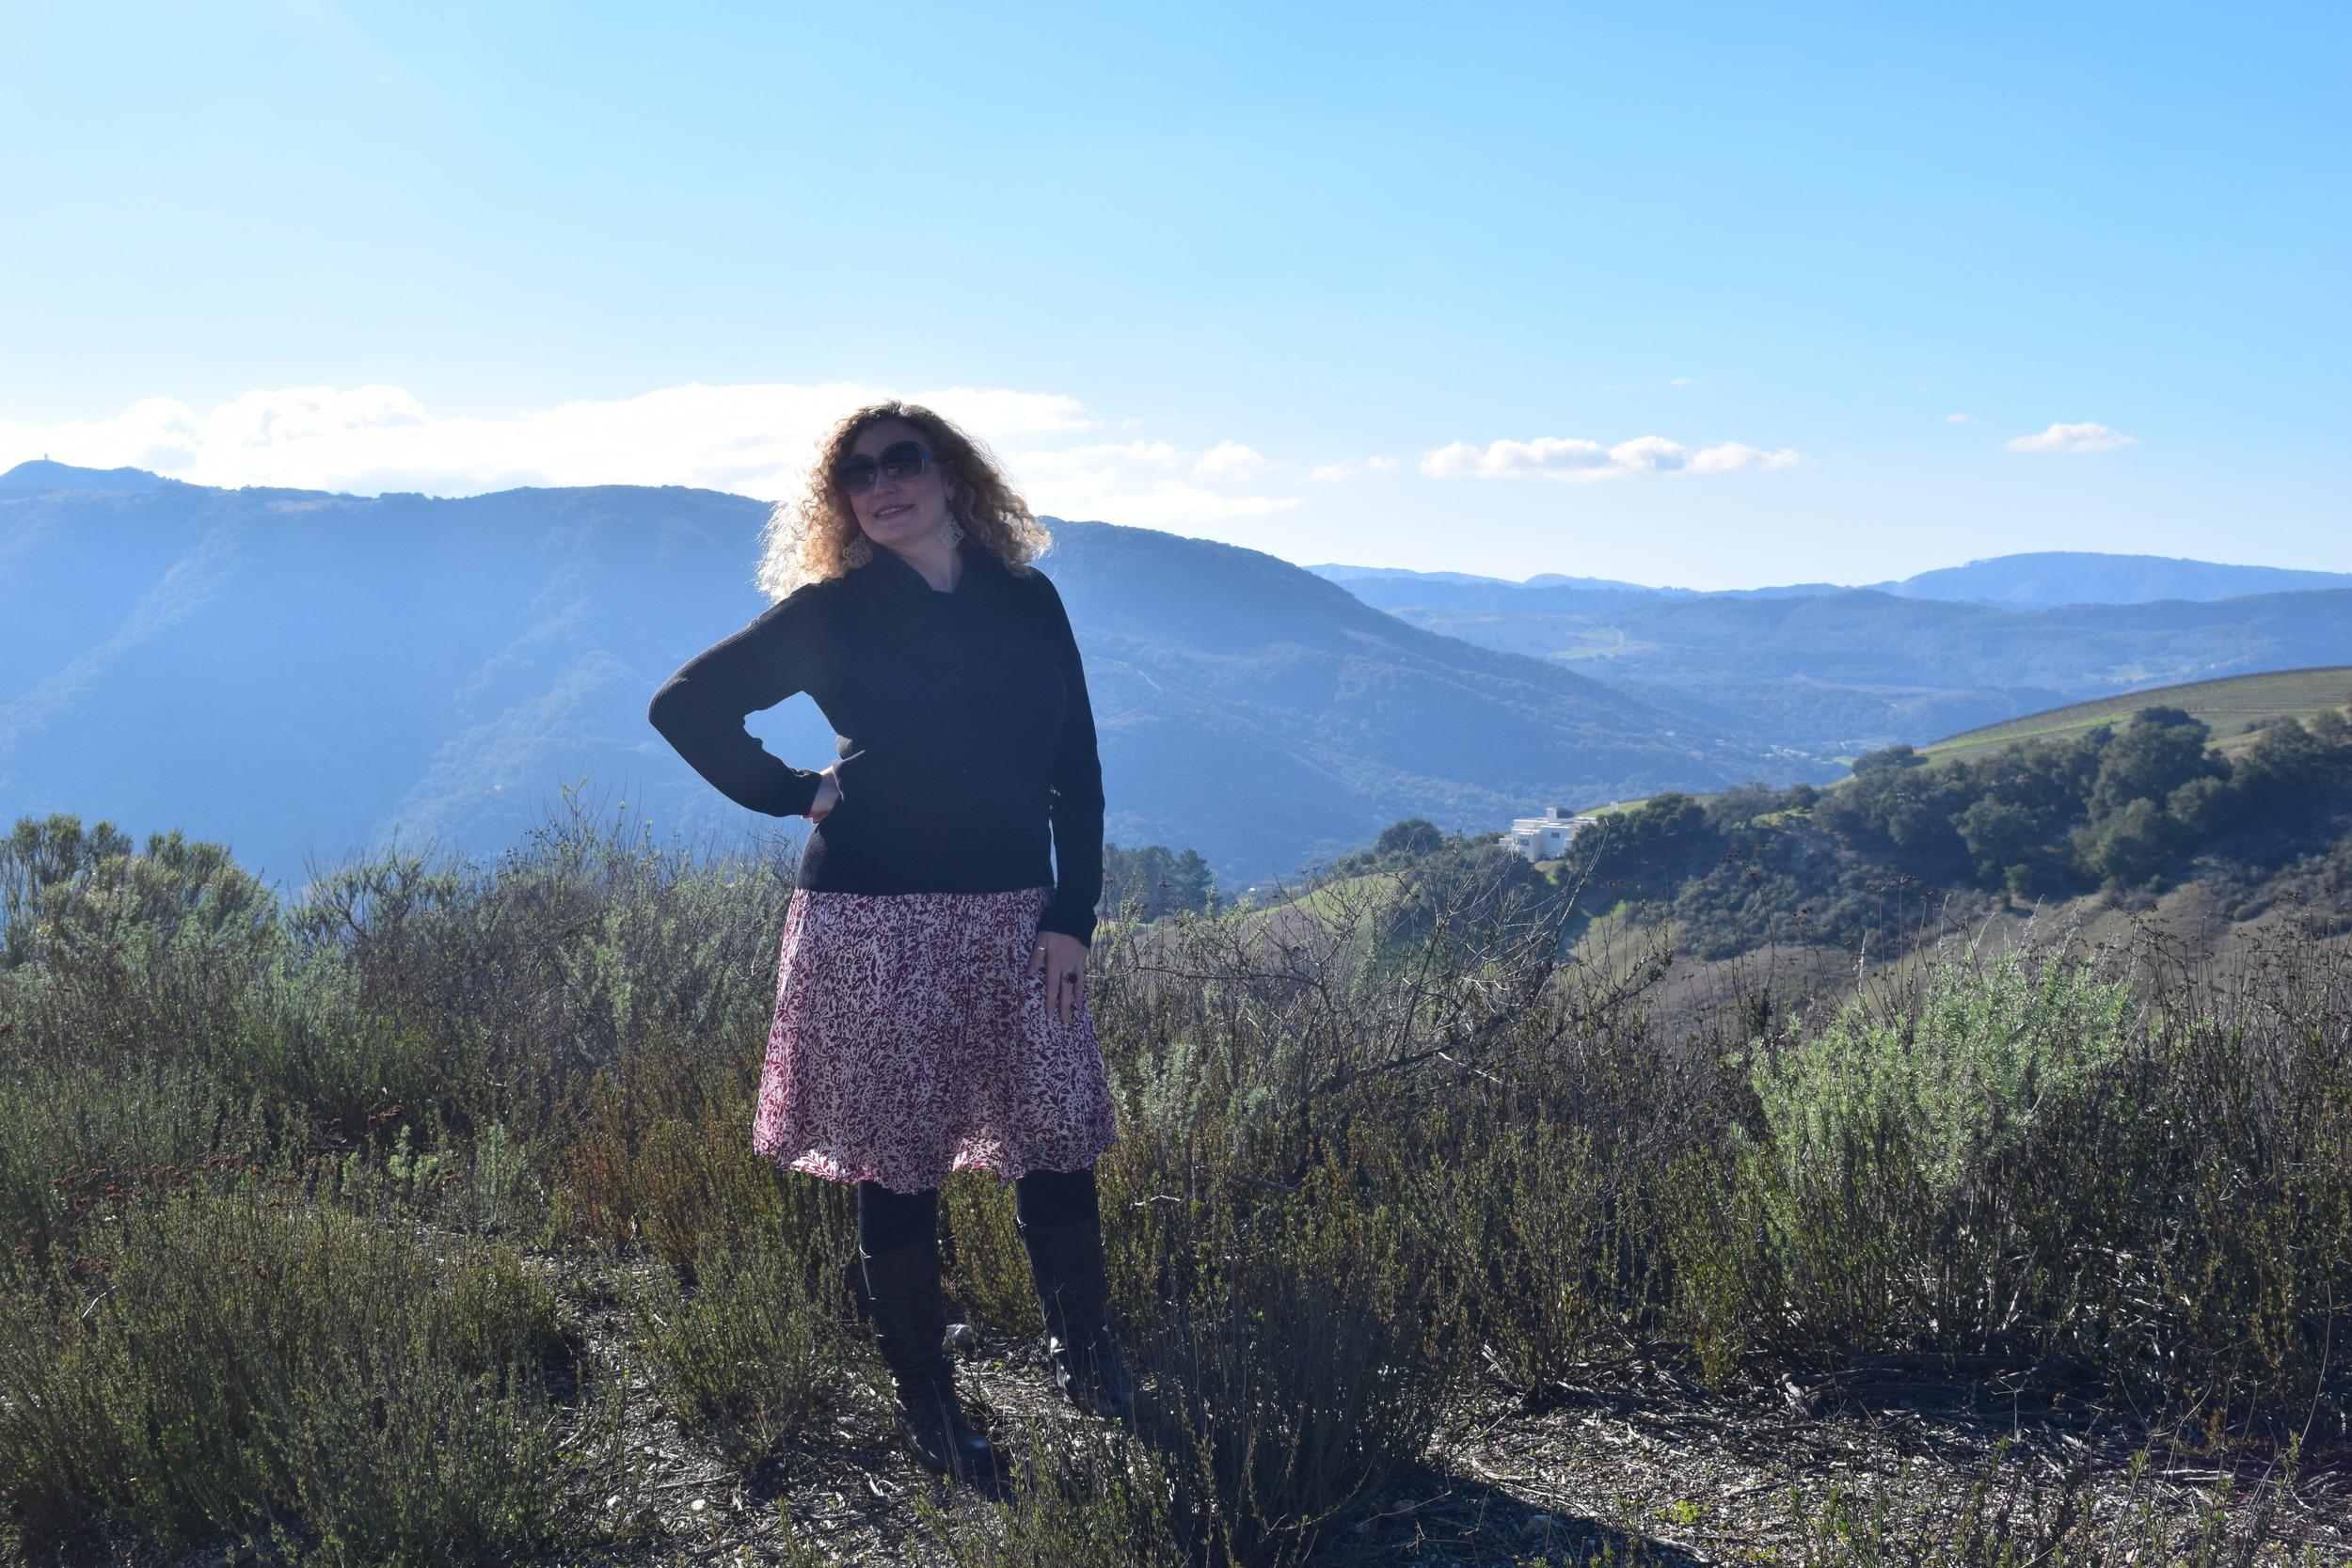 The Carmel Valley. Photo by Gabriel Manzo.